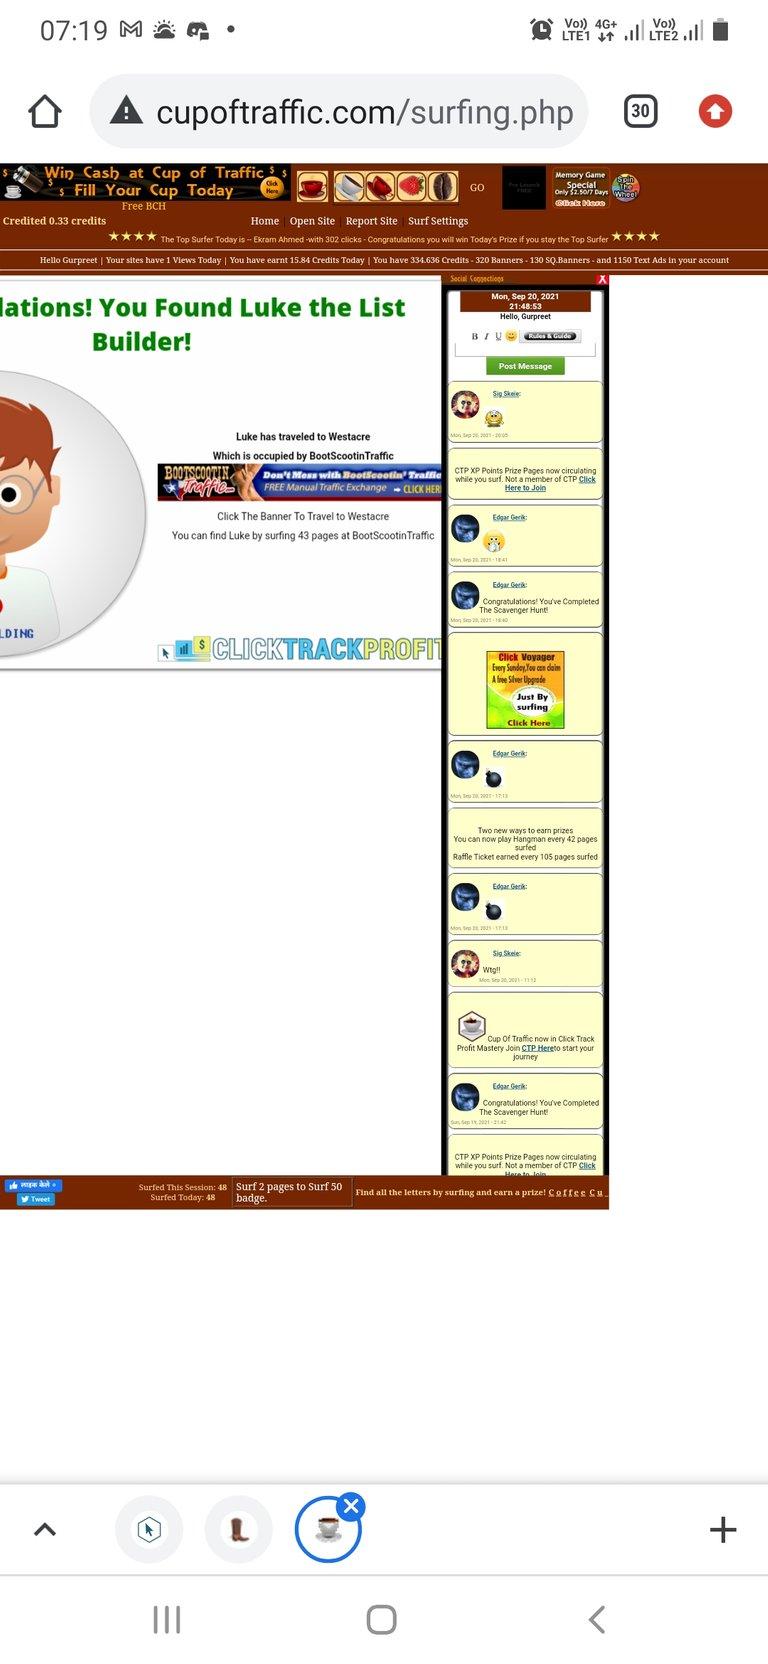 img_0.9631243689802281.jpg